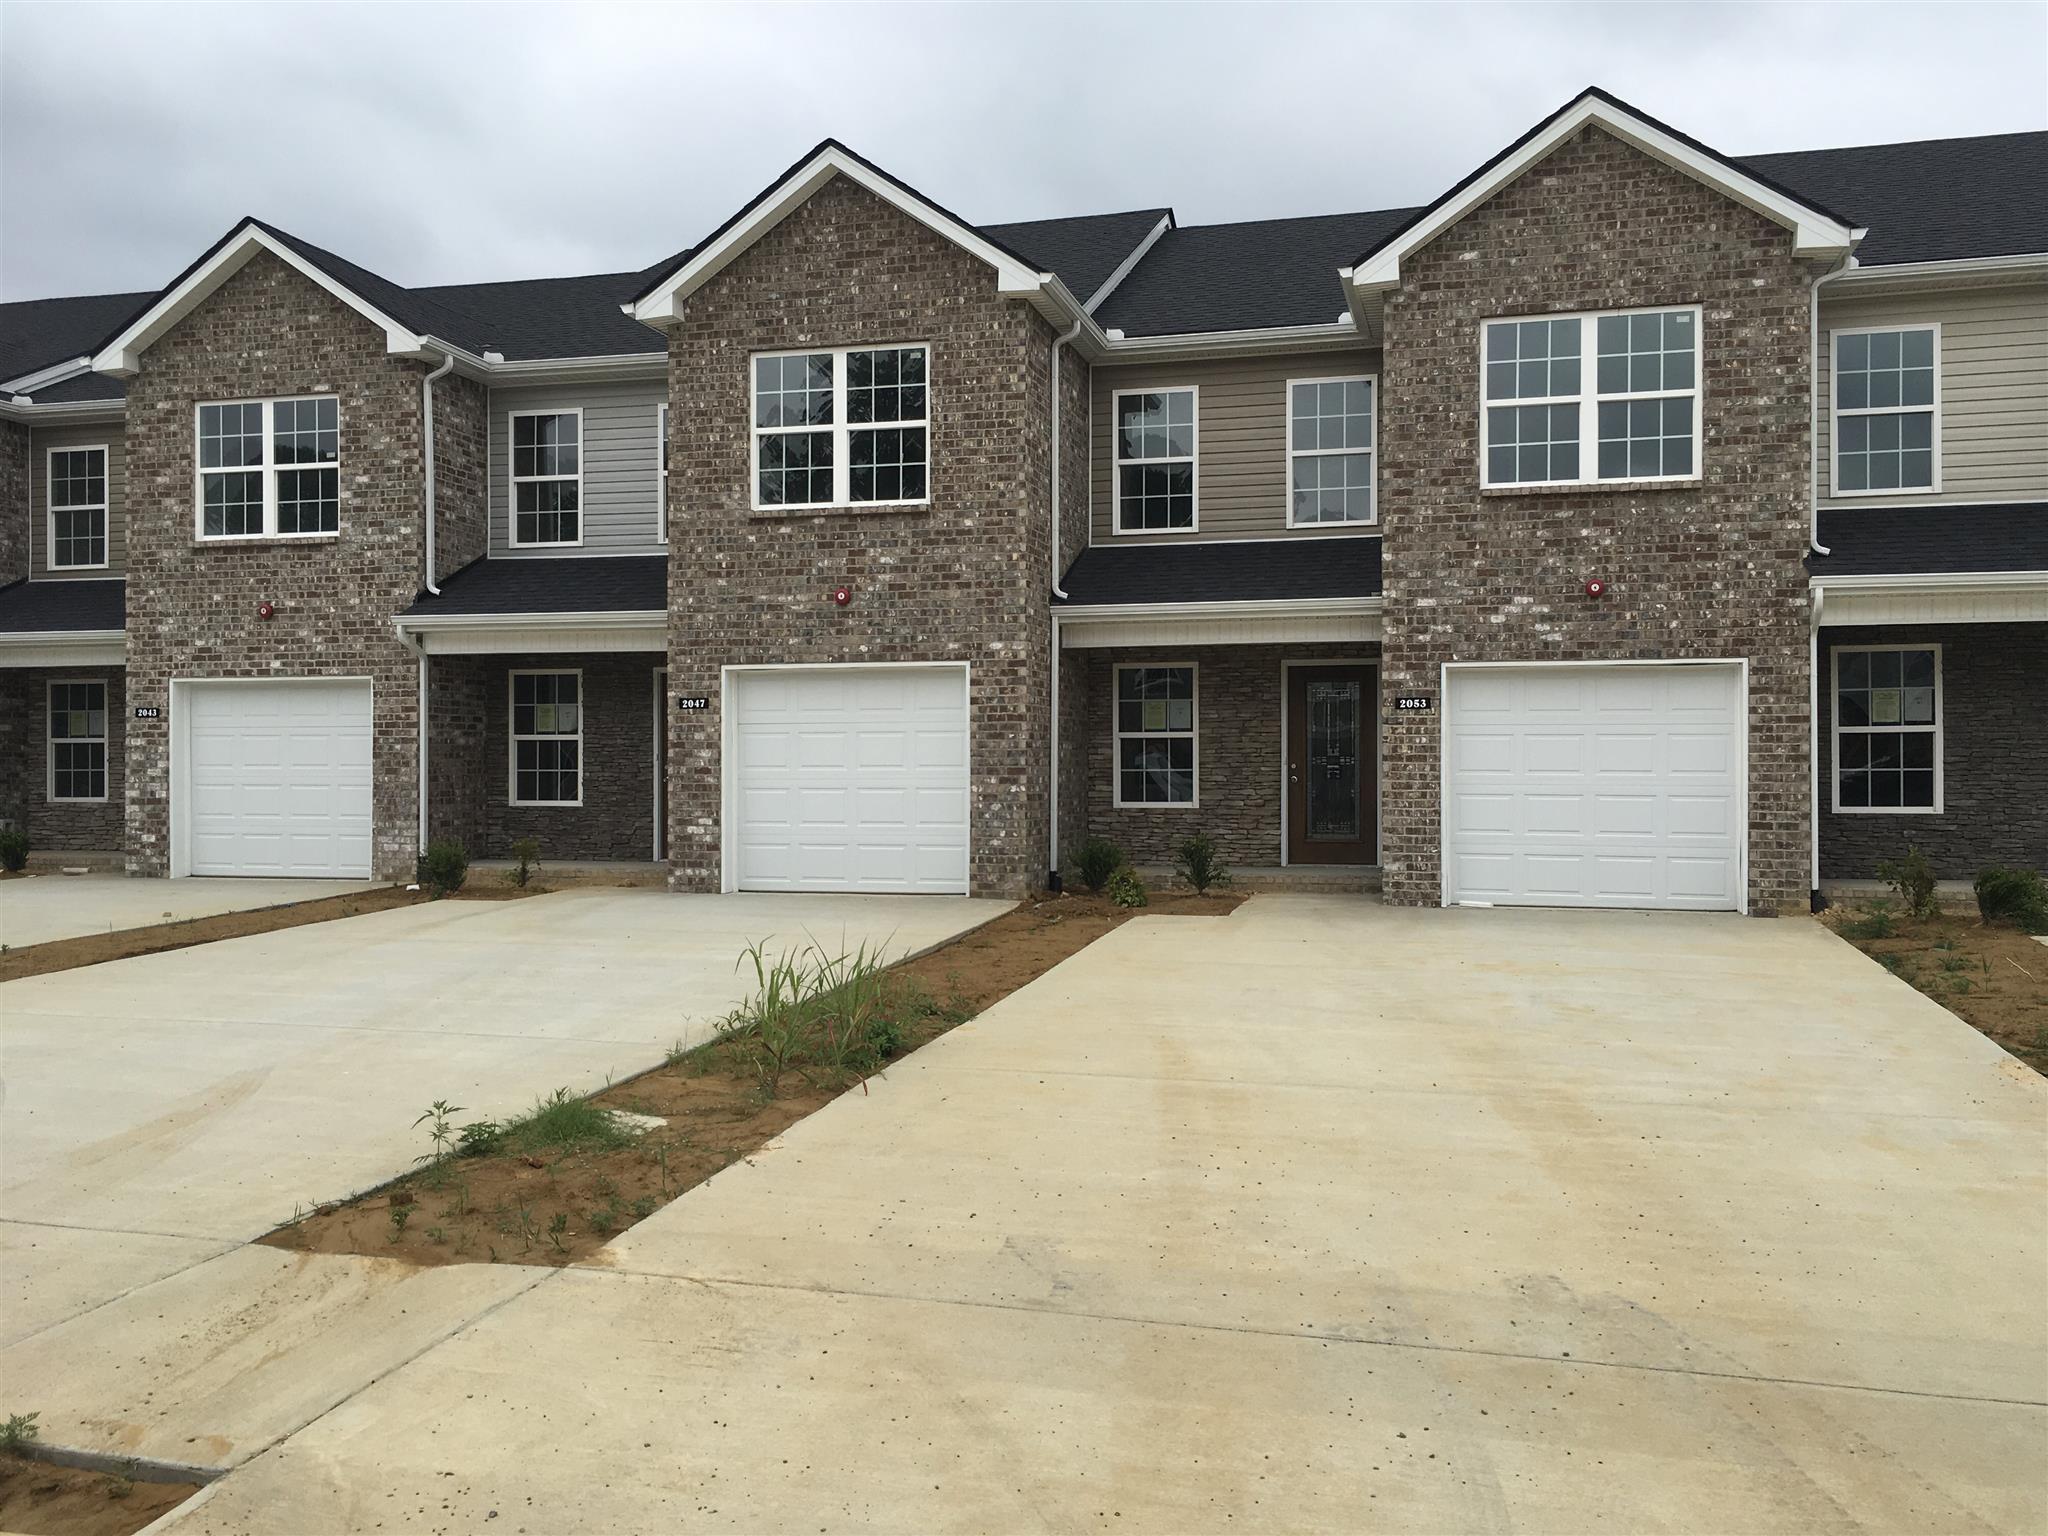 2053 Downstream Drive, Ashland City, TN 37015 - Ashland City, TN real estate listing